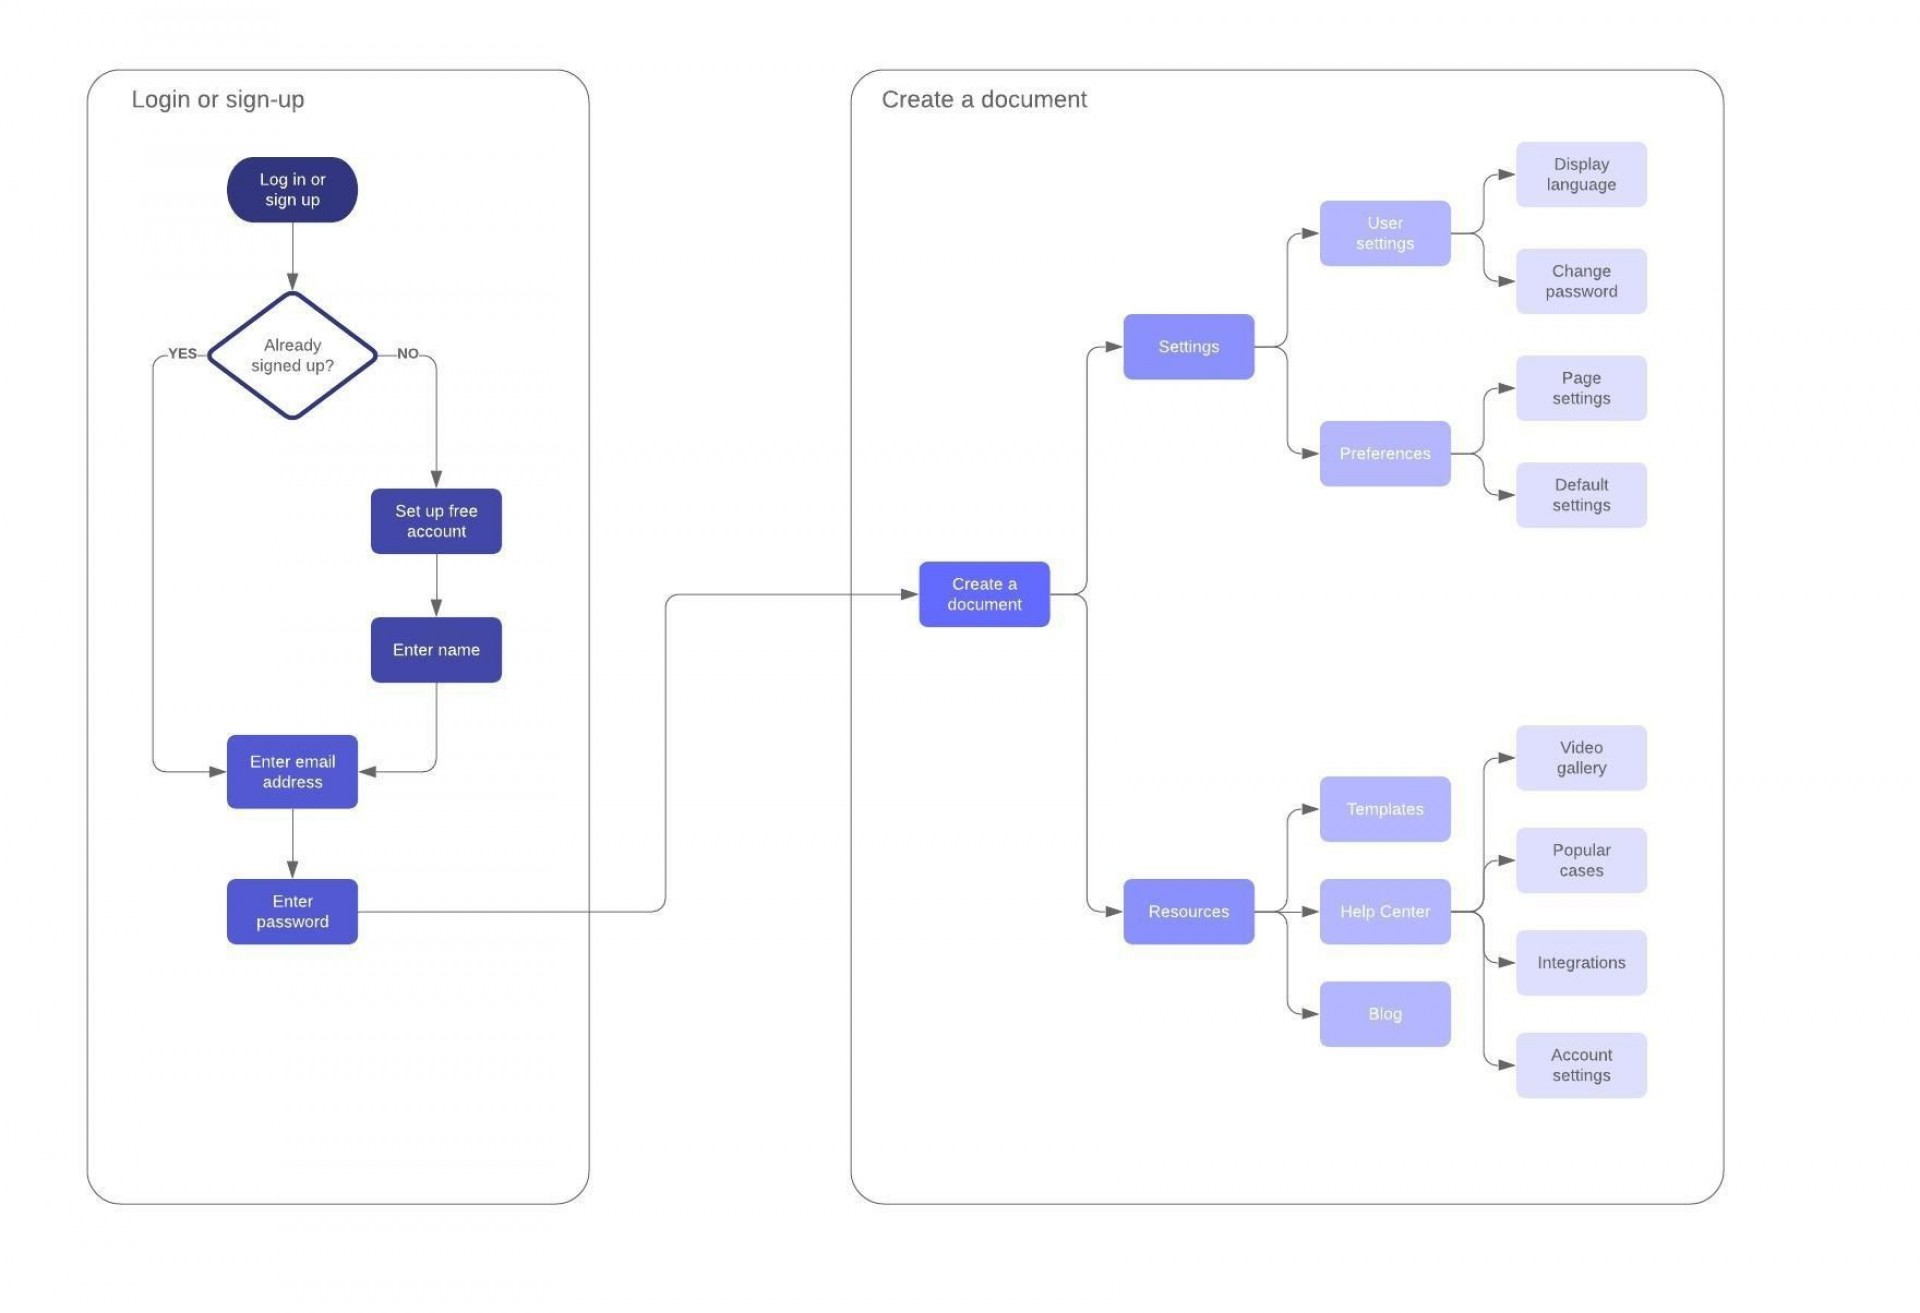 007 Outstanding Online Flow Chart Template High Resolution  Flowchart Proces Diagram1920